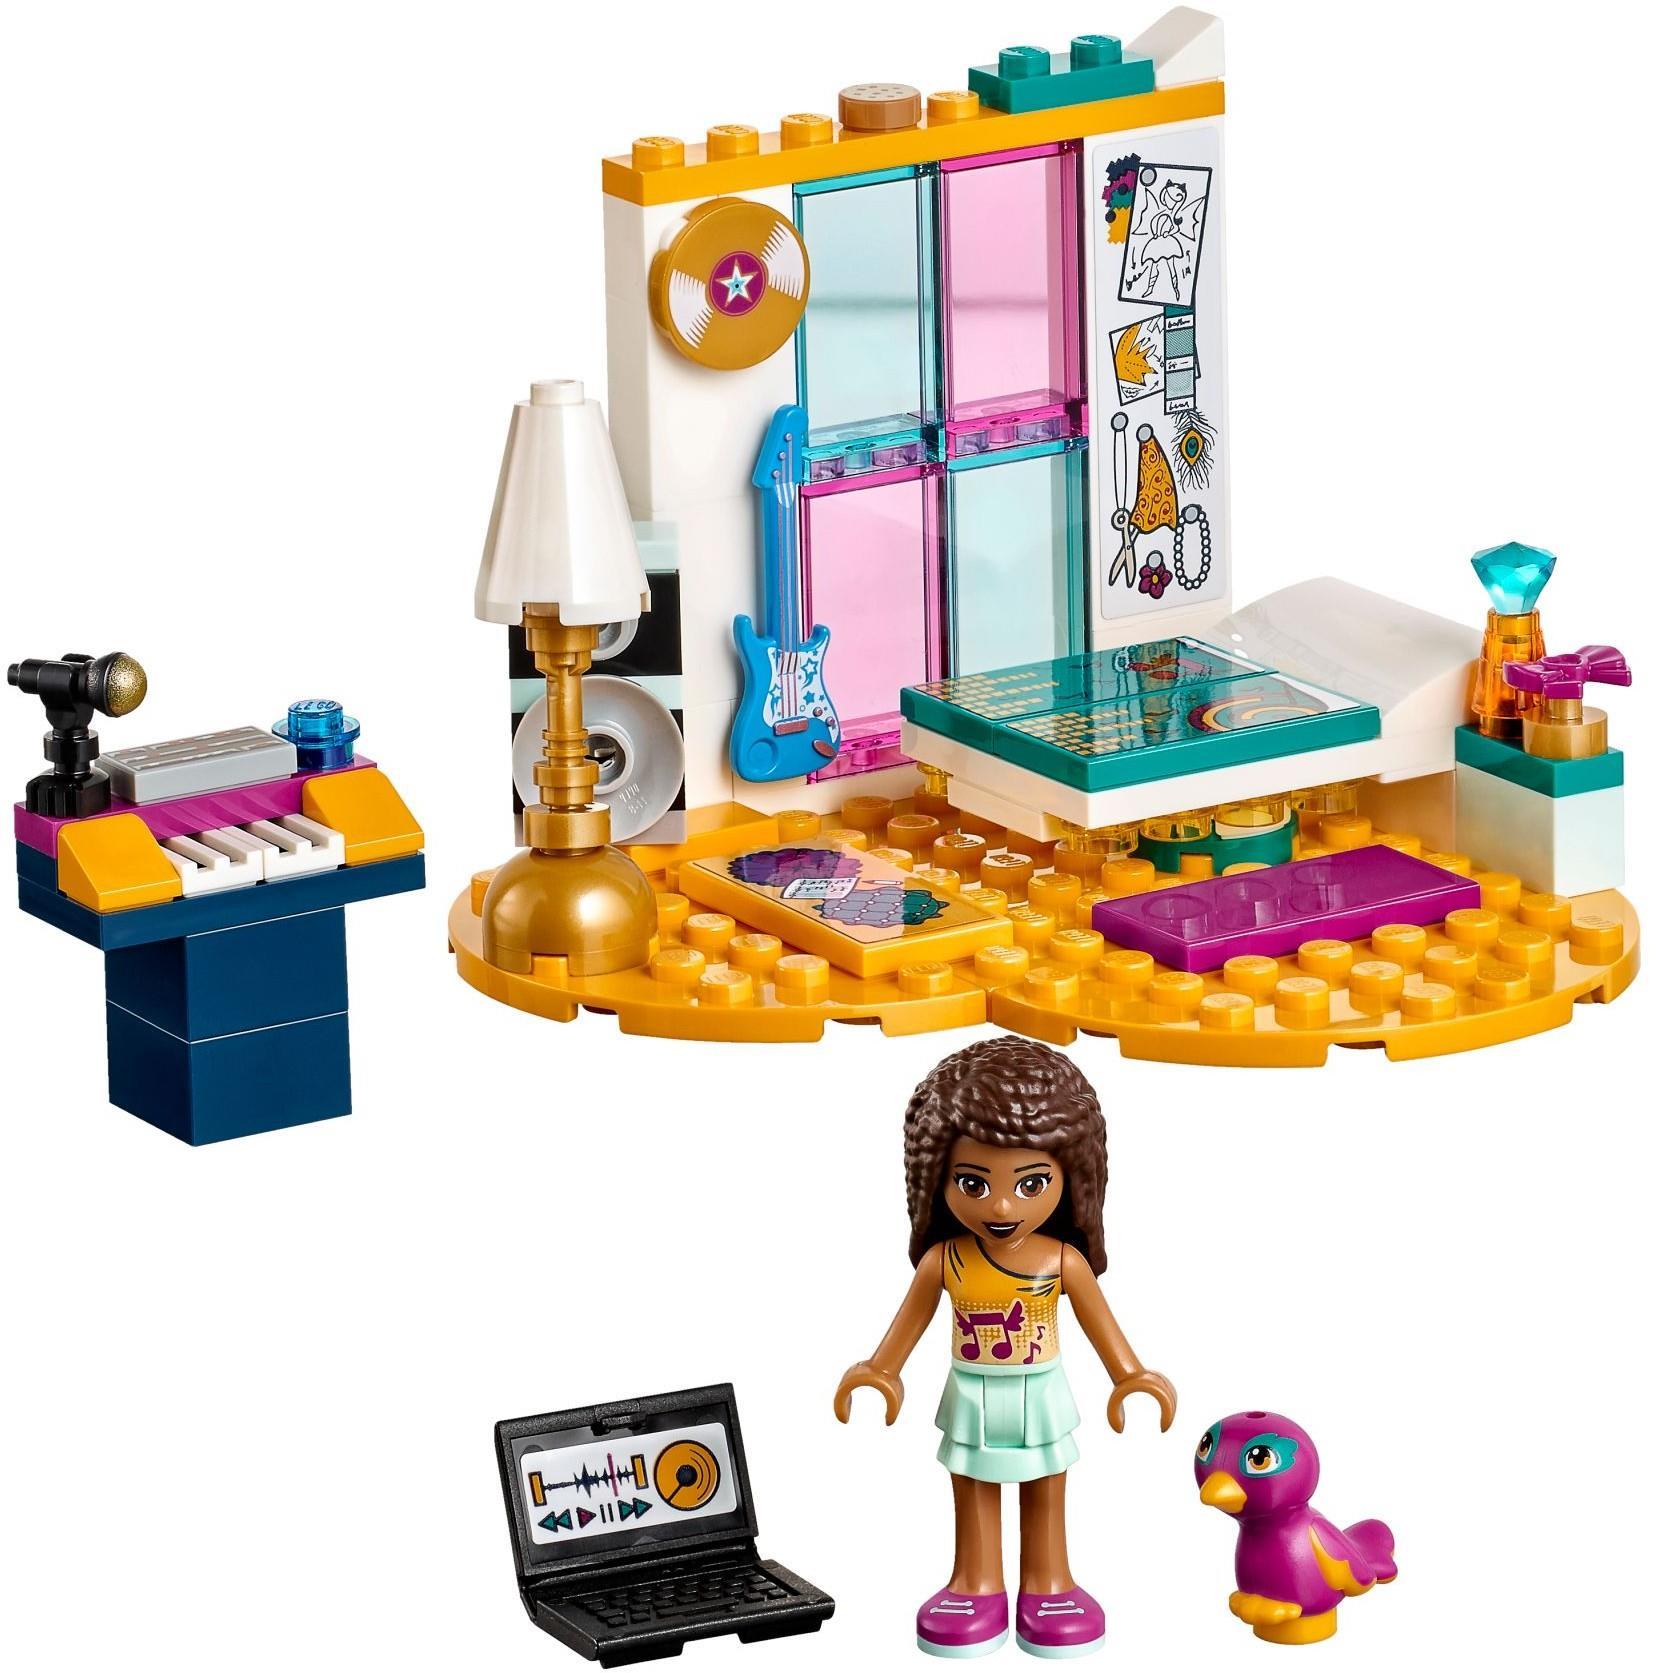 Lego 41341 Friends Andrea S Bedroom Brickeconomy